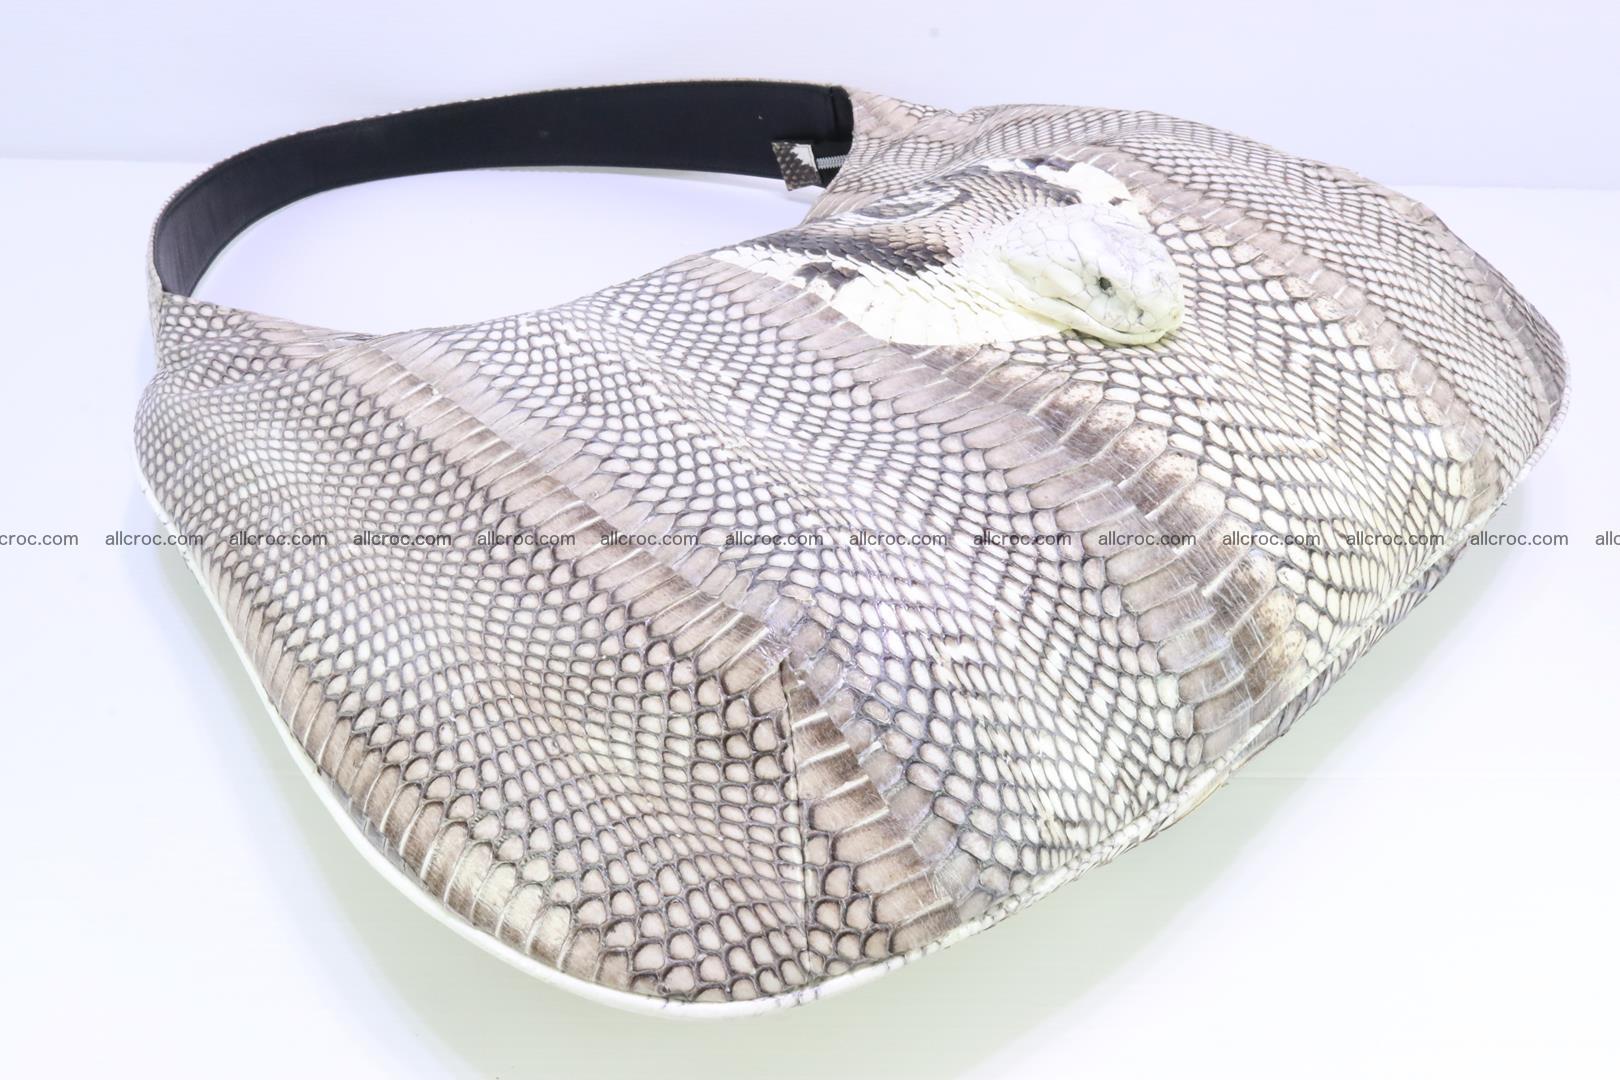 Cobra skin ladies handbag with head of cobra 194 Foto 12